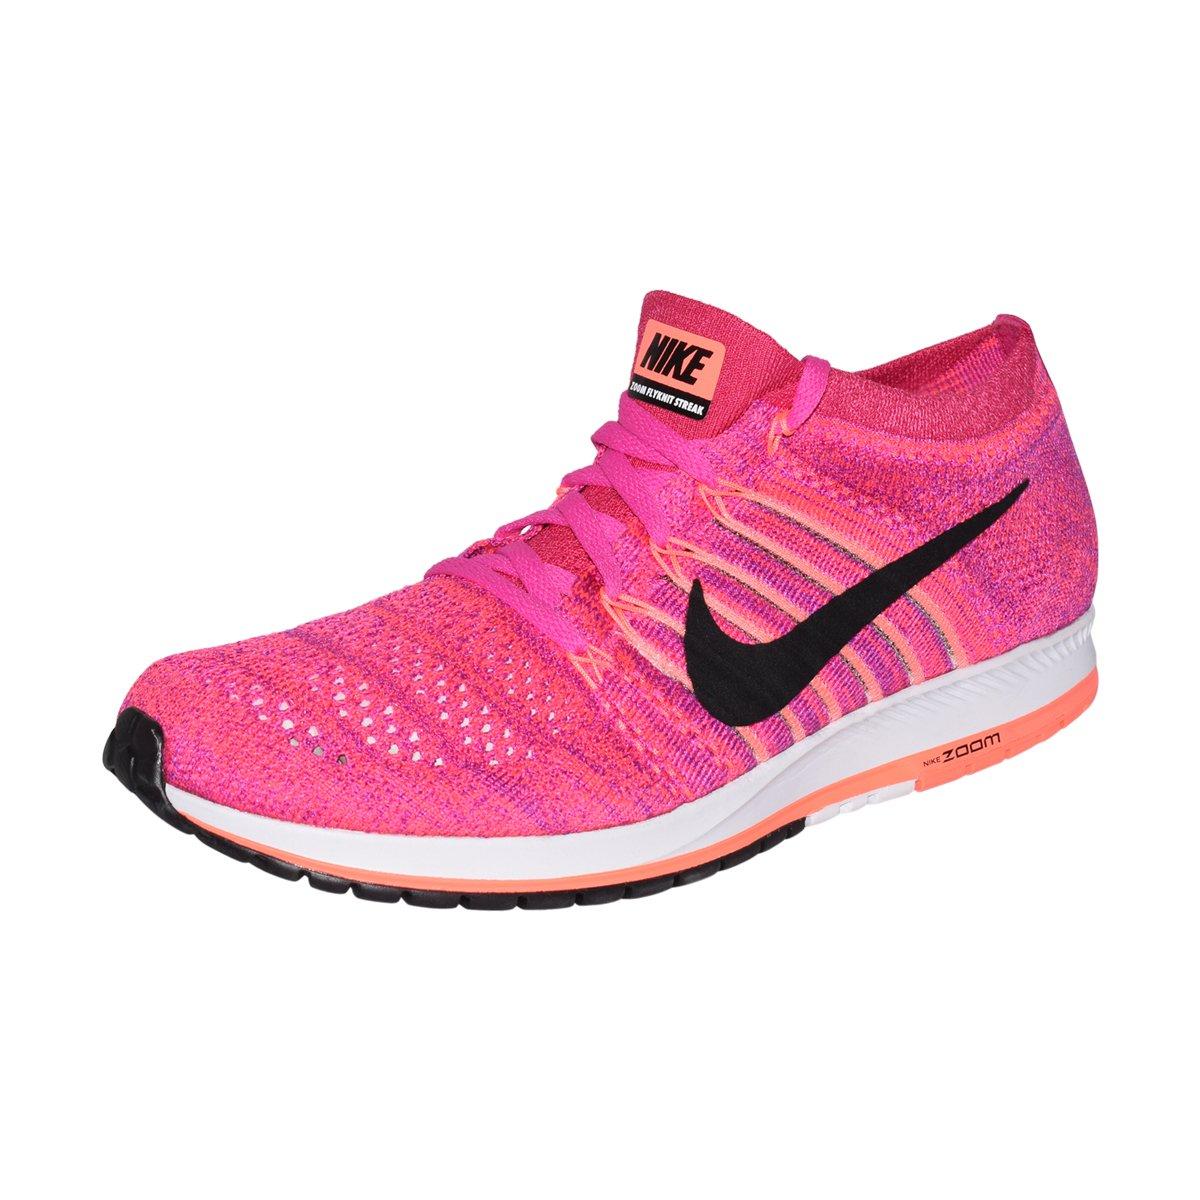 d6db616d25887 NIKE Flyknit Streak Unisex Running Shoe (Fireberry/Black-Racer Pink ...